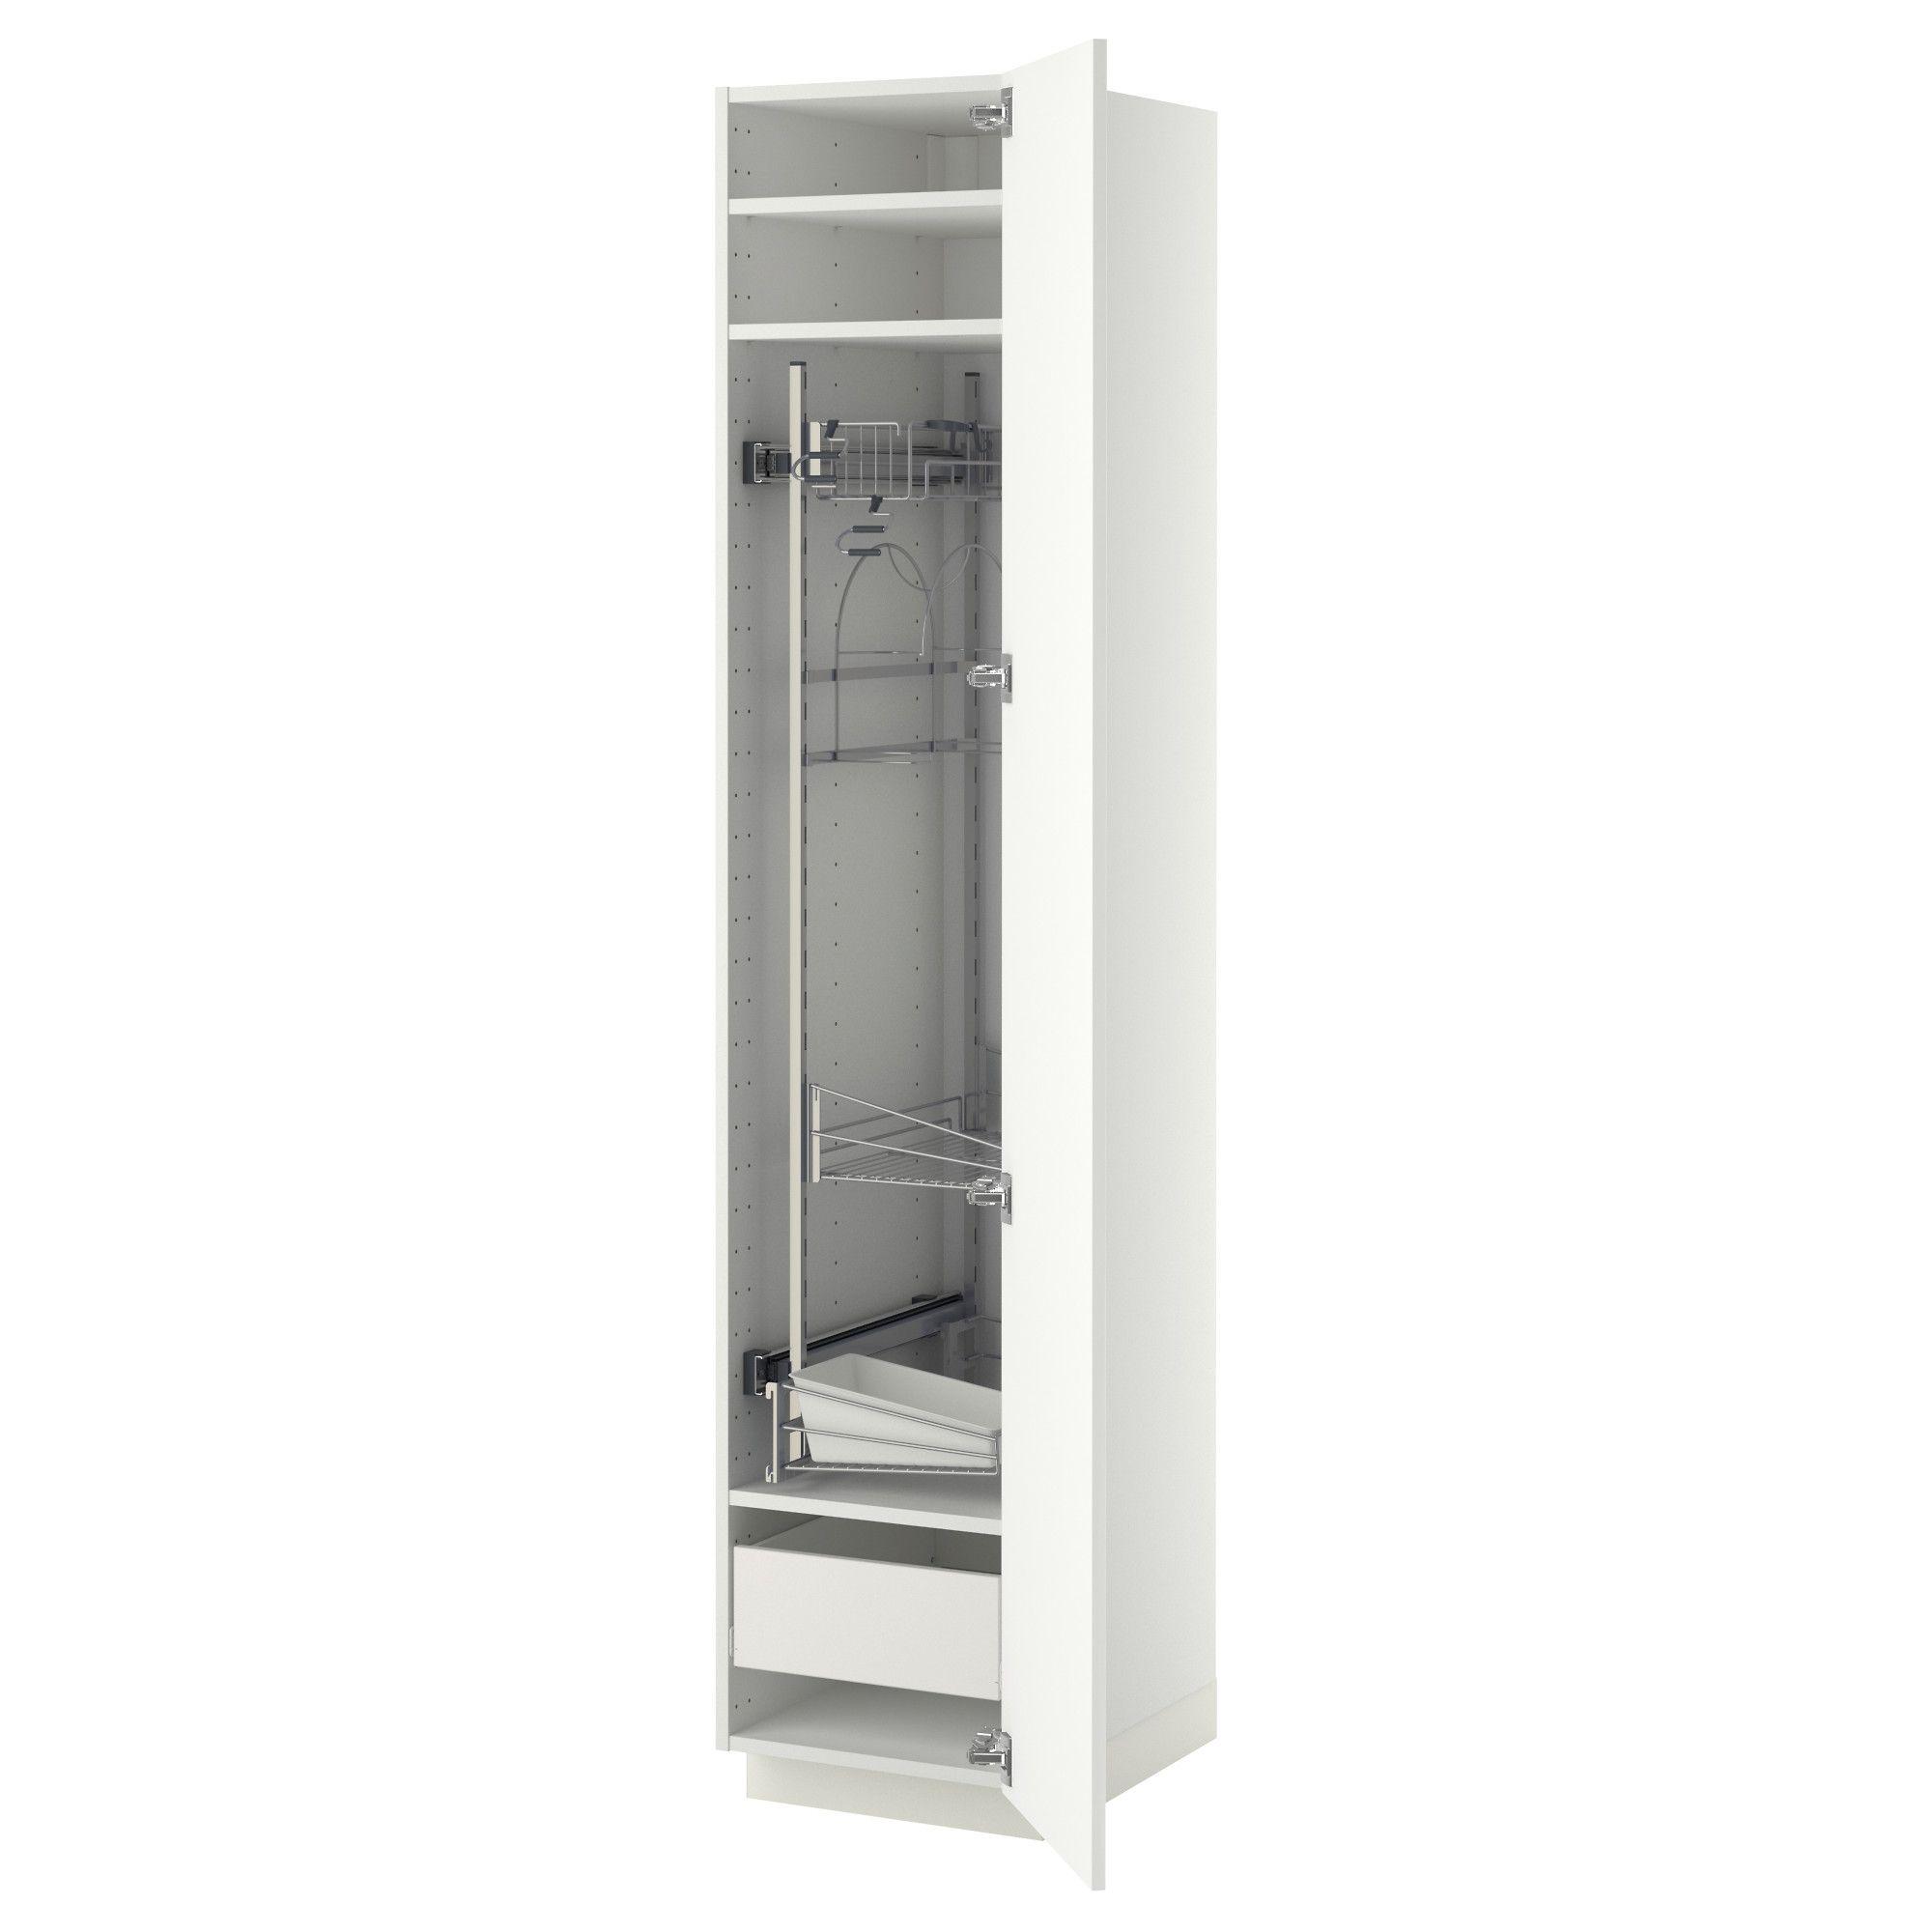 Minimalismo luvan inspiration - Ikea armarios de cocina ...